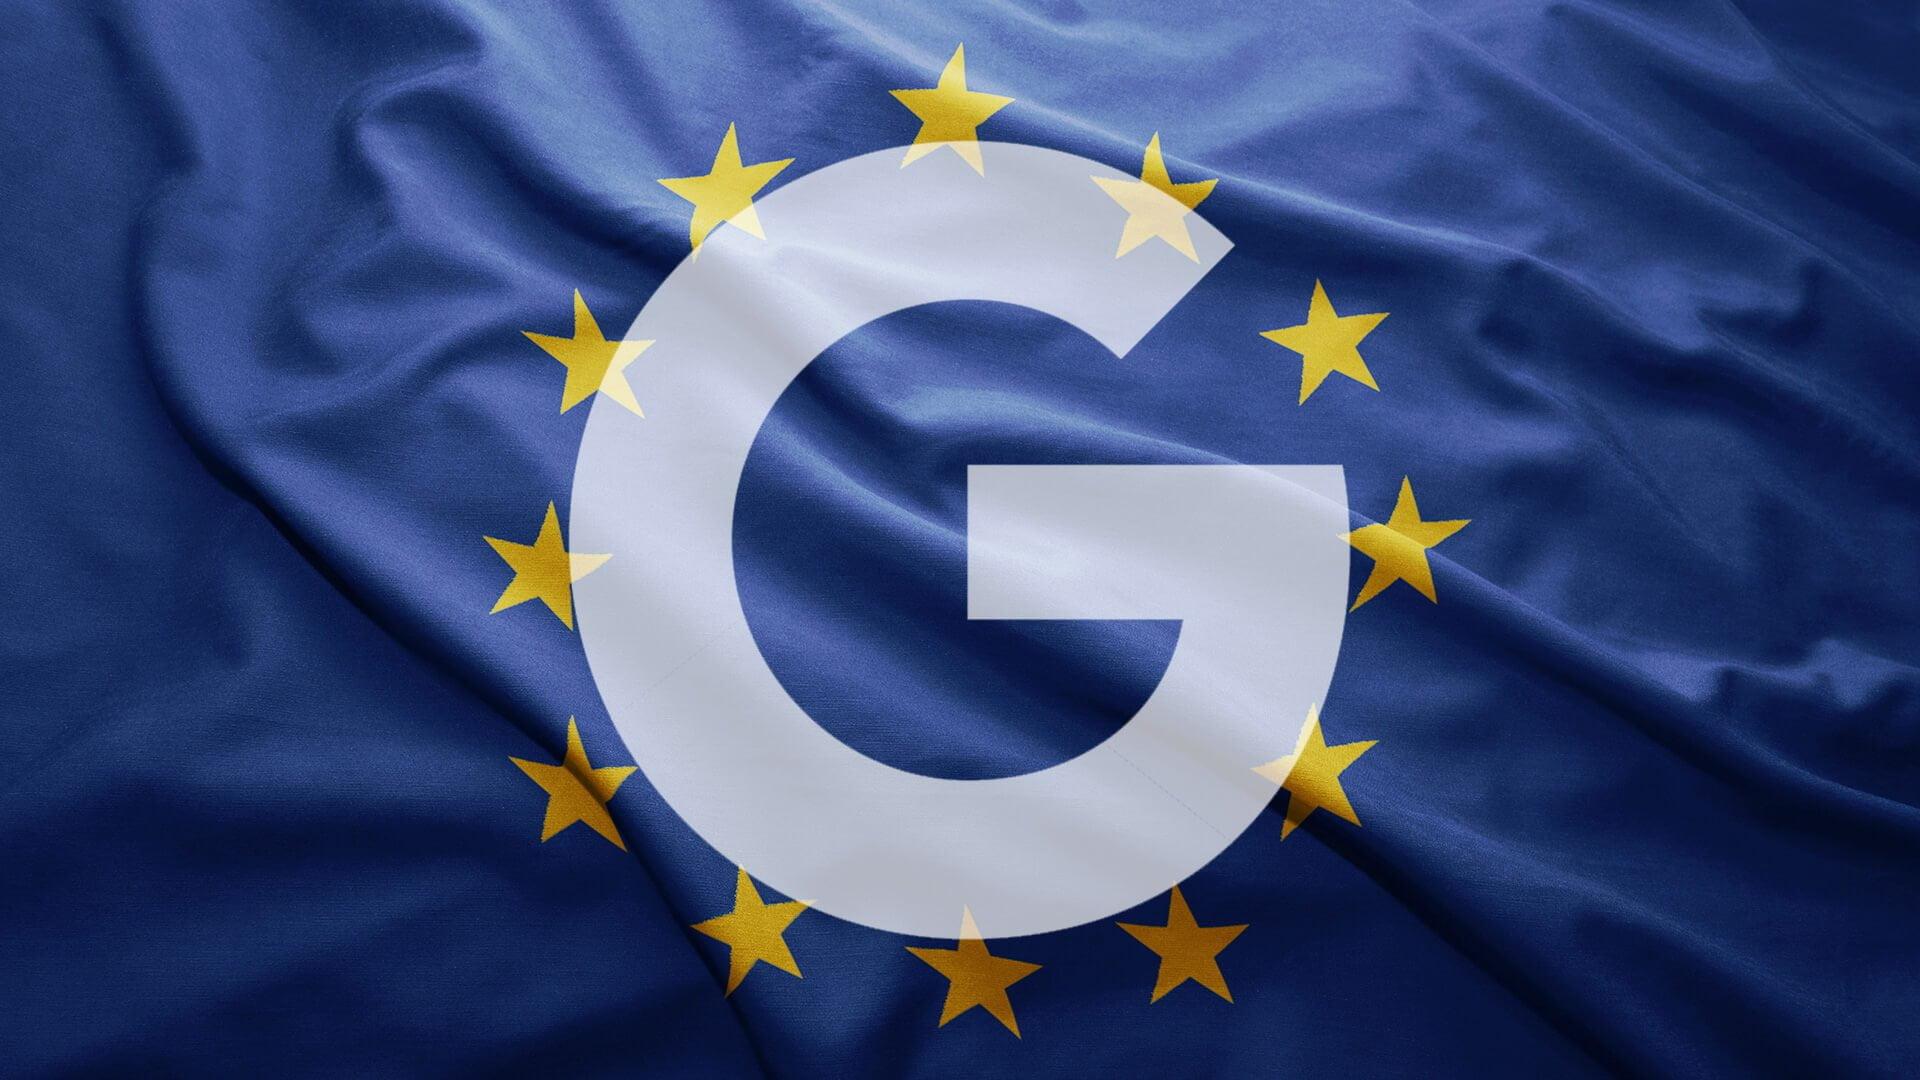 Google to appeal $2.7 billion EU fine